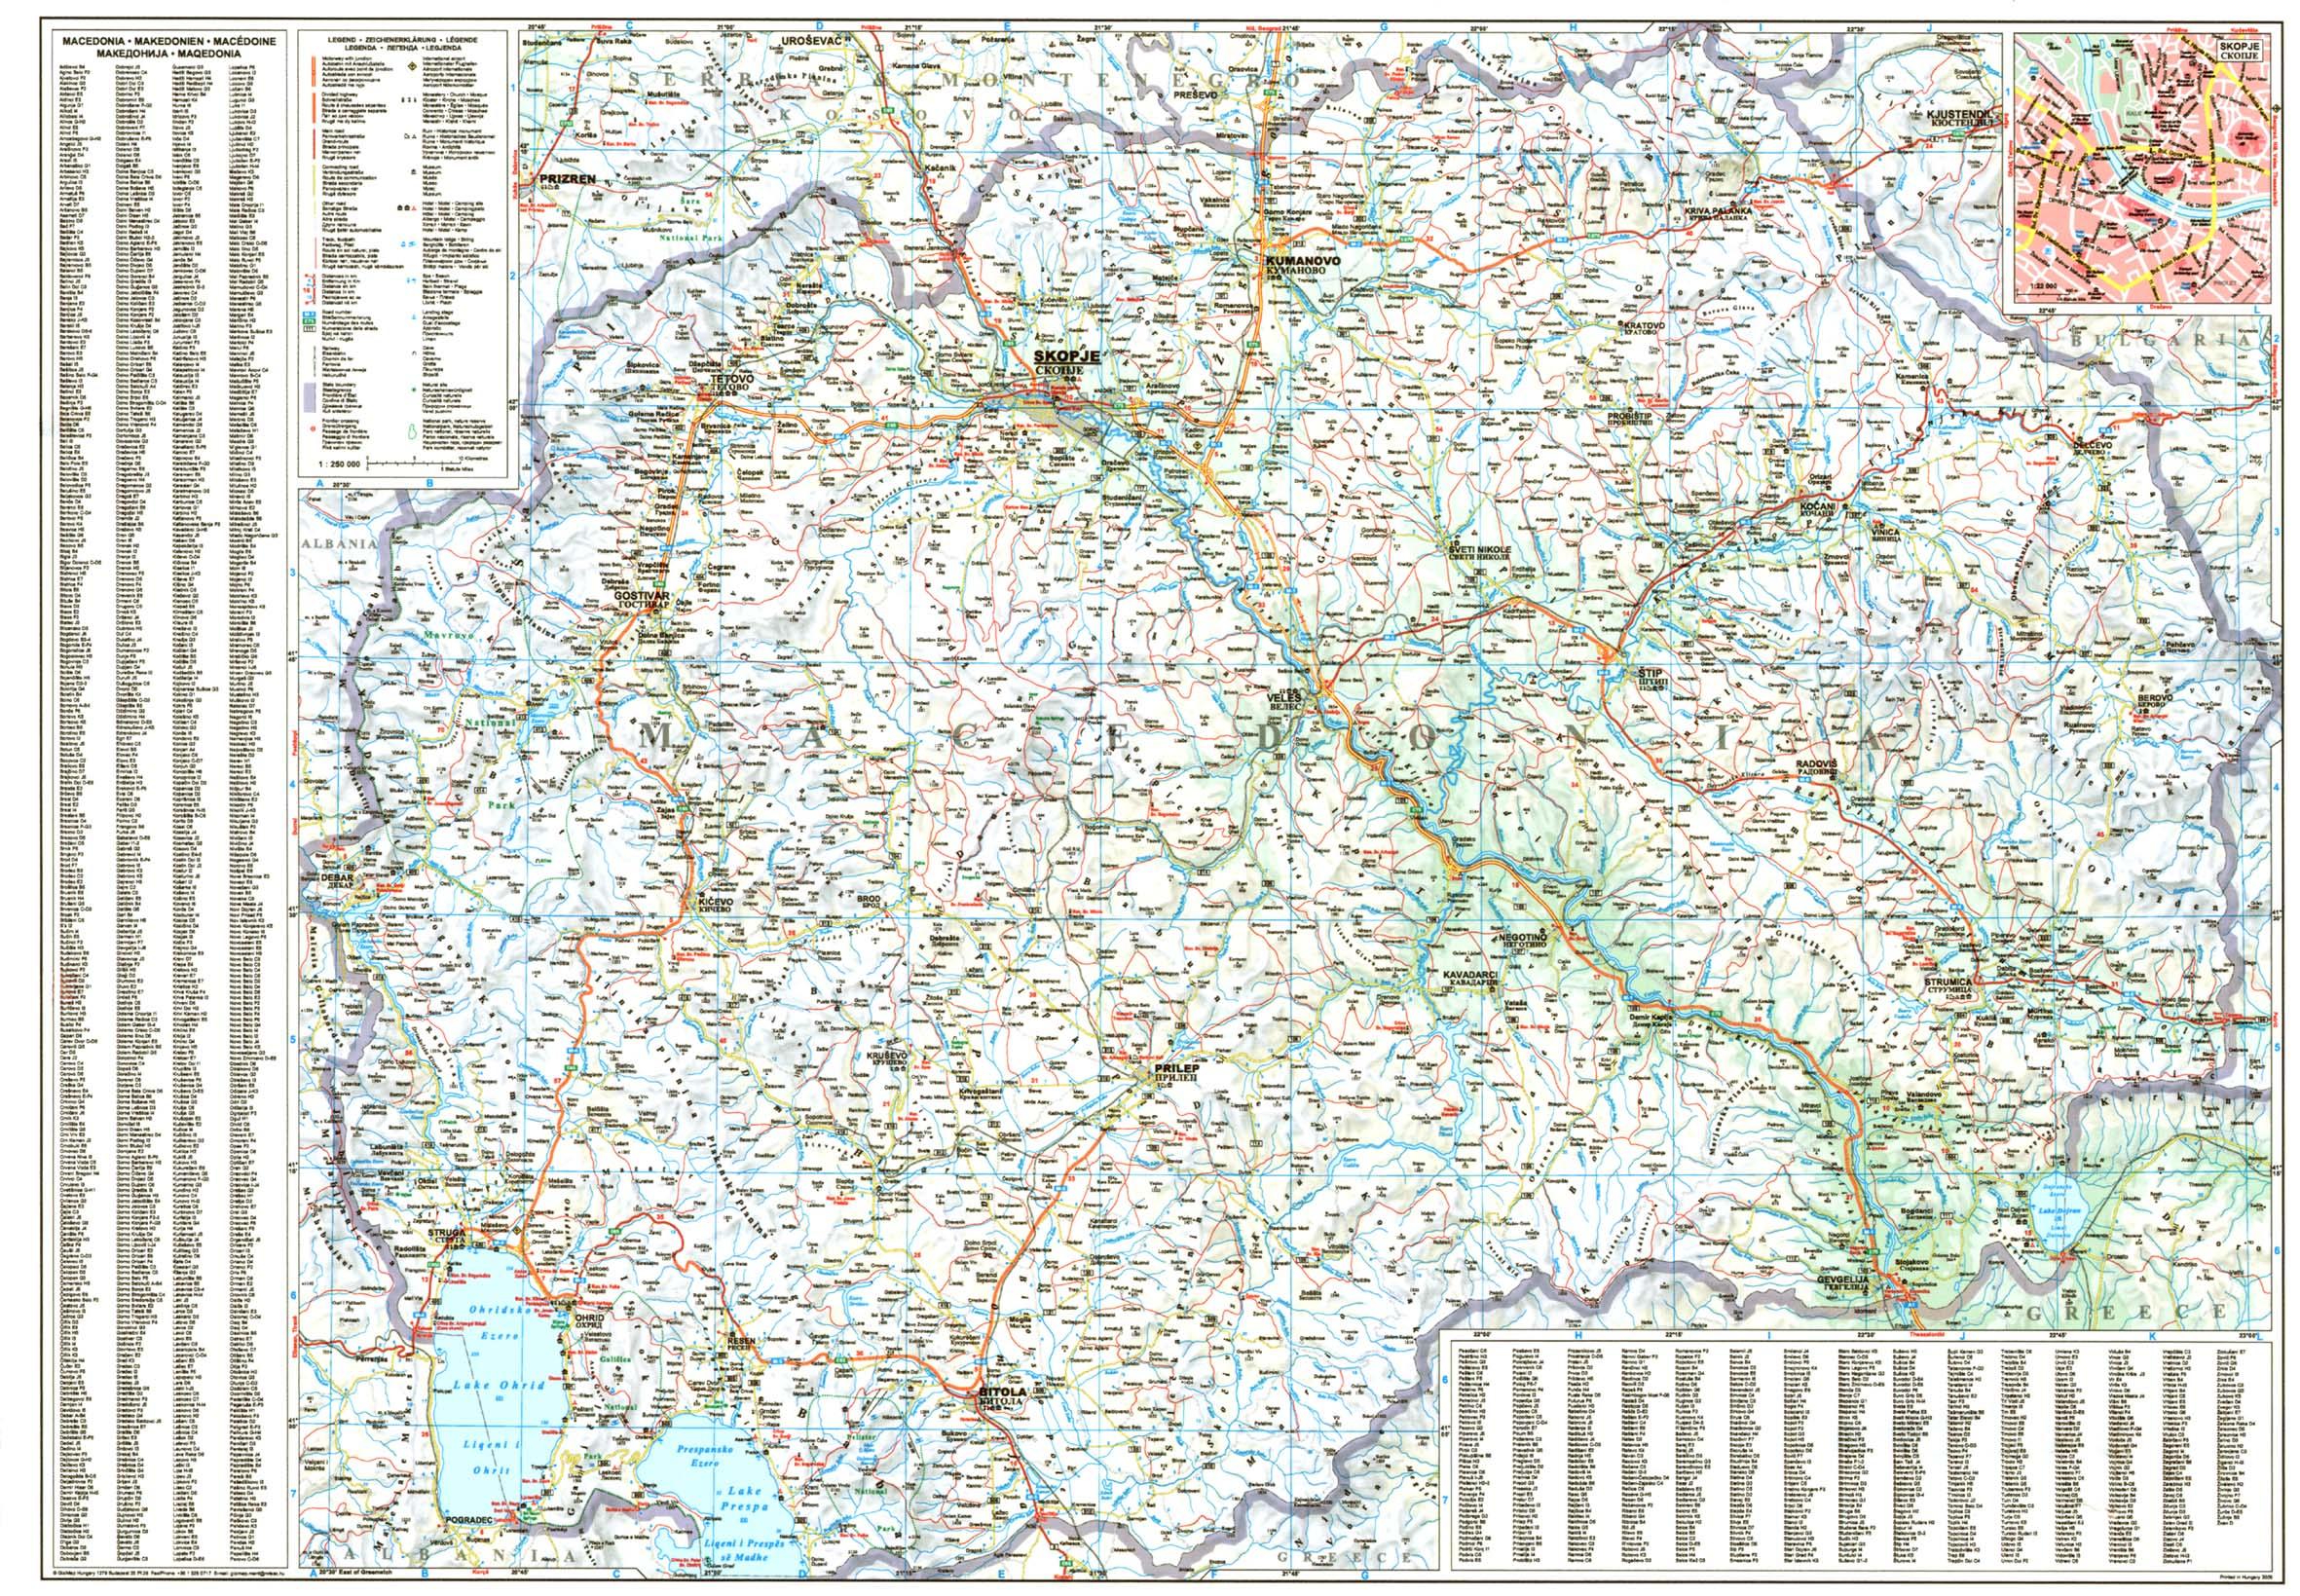 Macedonia map Easteurope Countries Europe Wall Maps